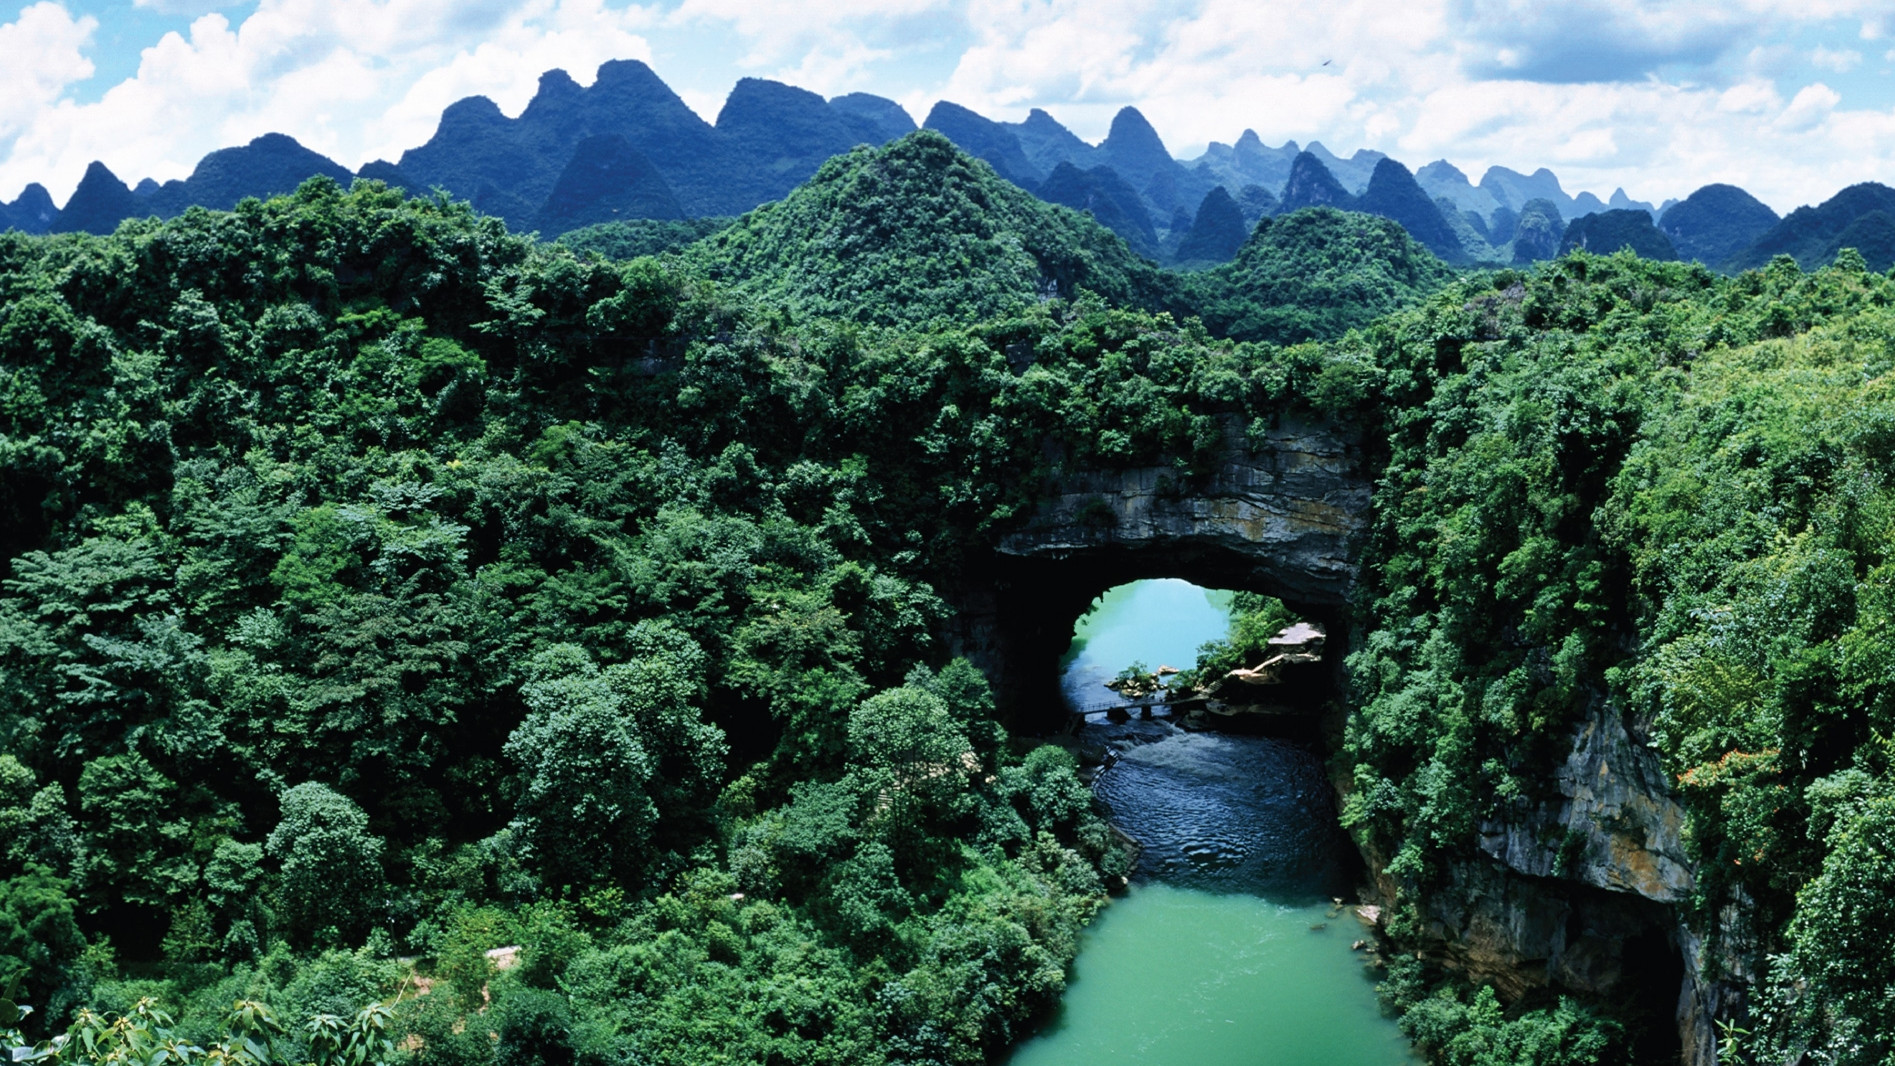 Luzhai Xiangqiao Karst National Geopark